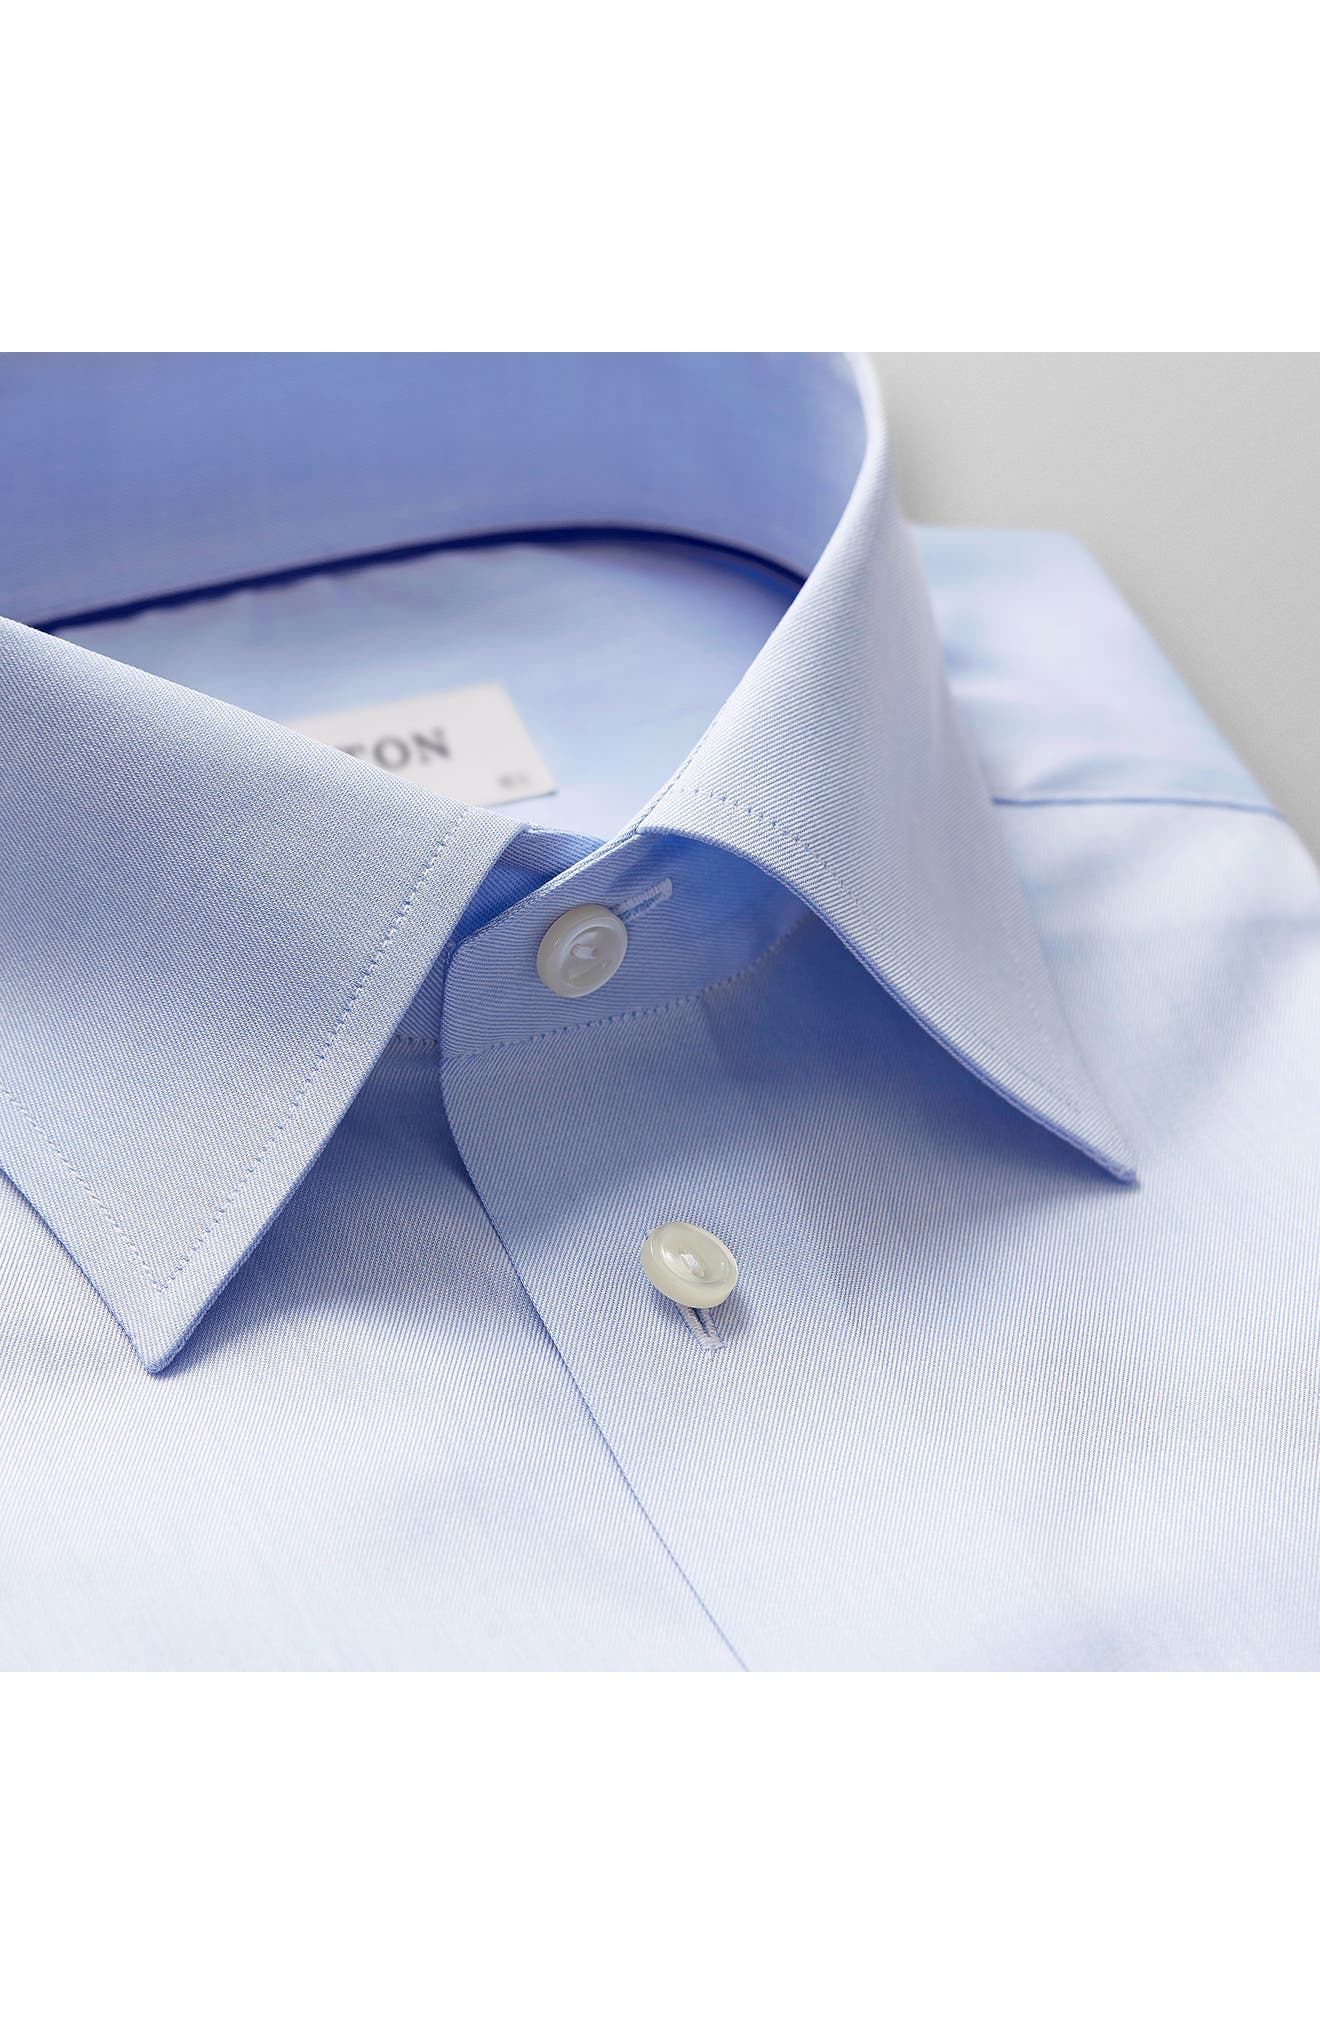 Alternate Image 2  - Eton Classic Fit Twill Dress Shirt